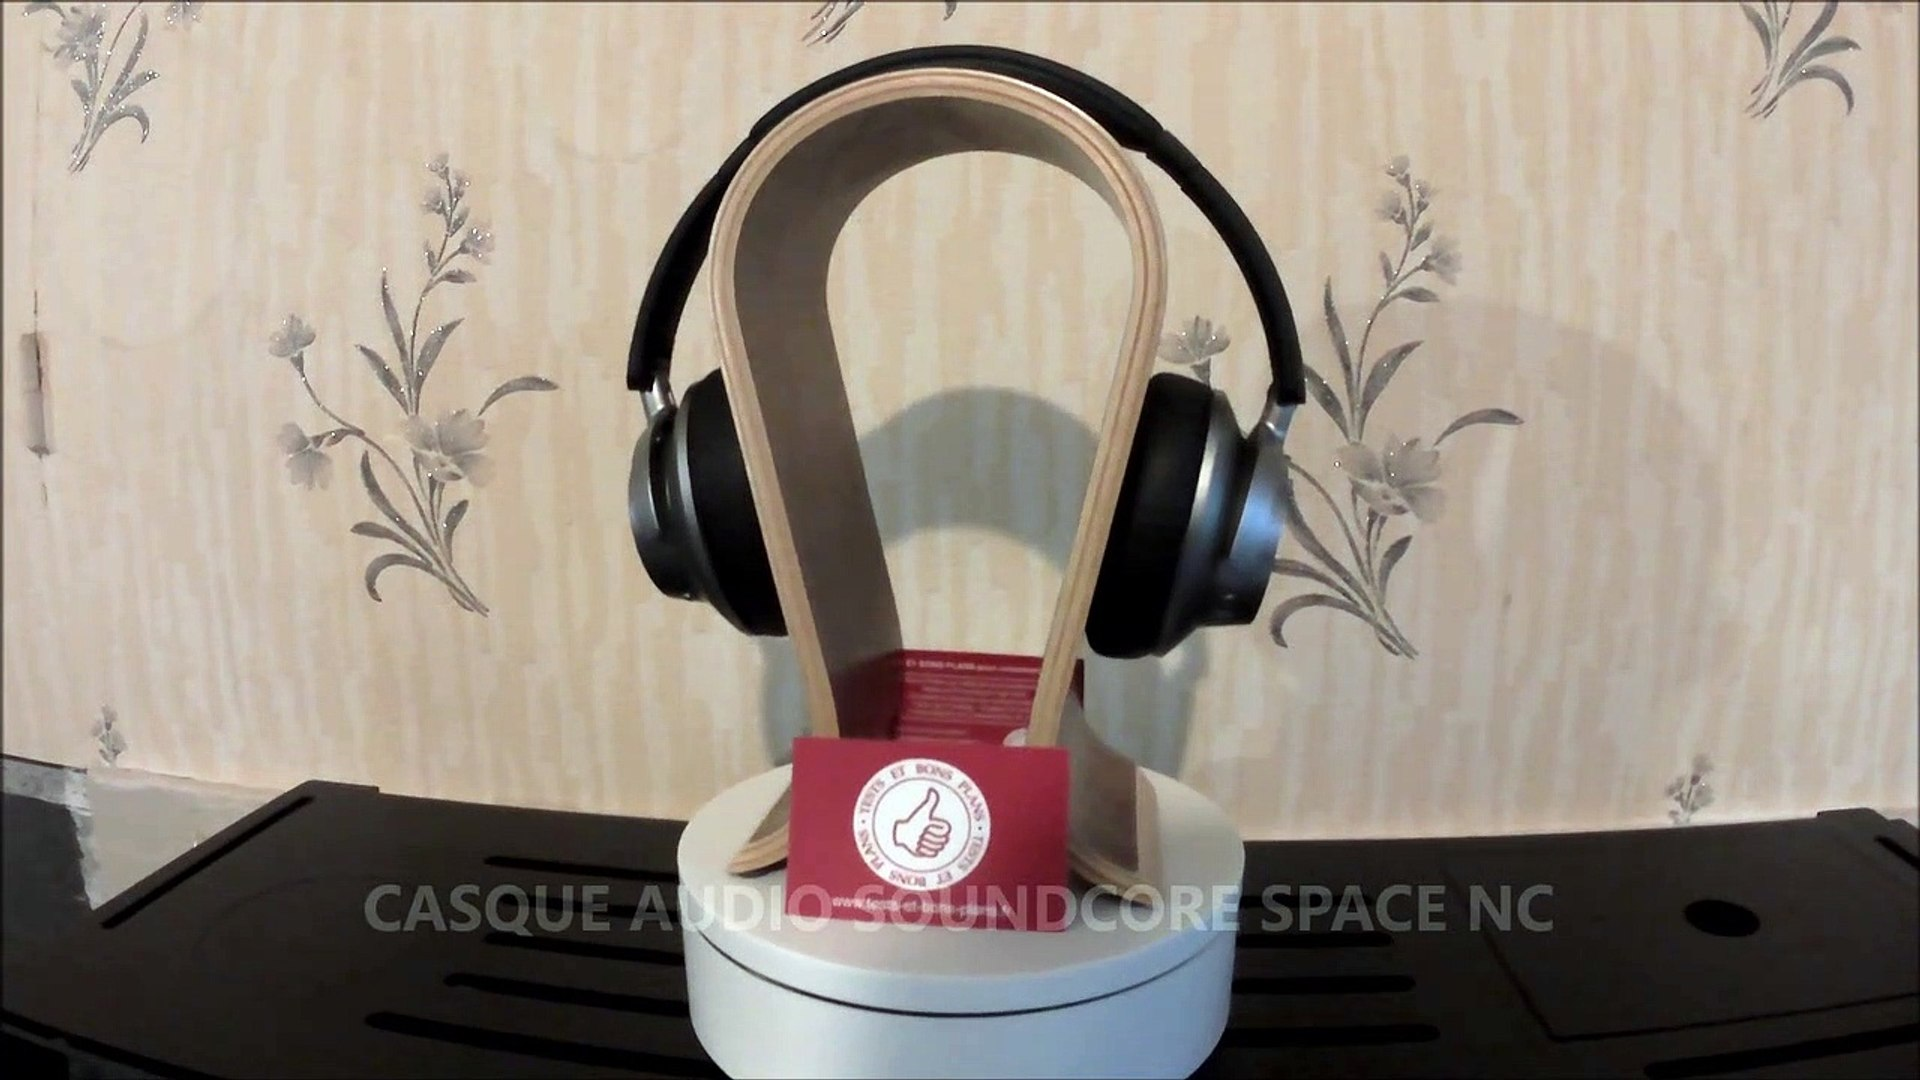 Casque Audio Soundcore Space Nc